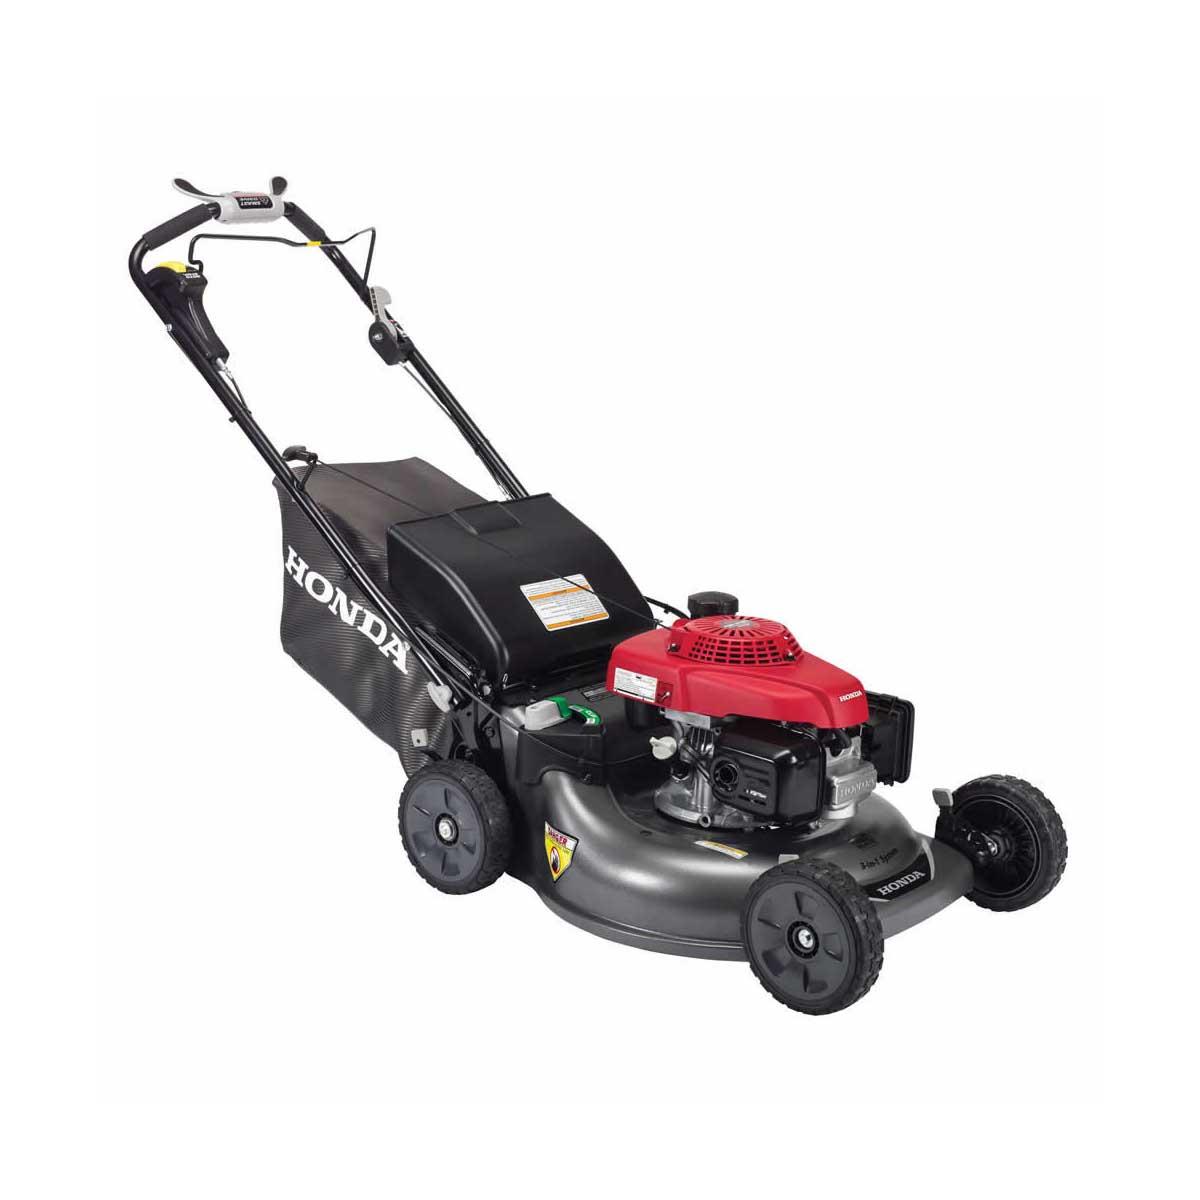 Honda Lawnmower HRR216VYA